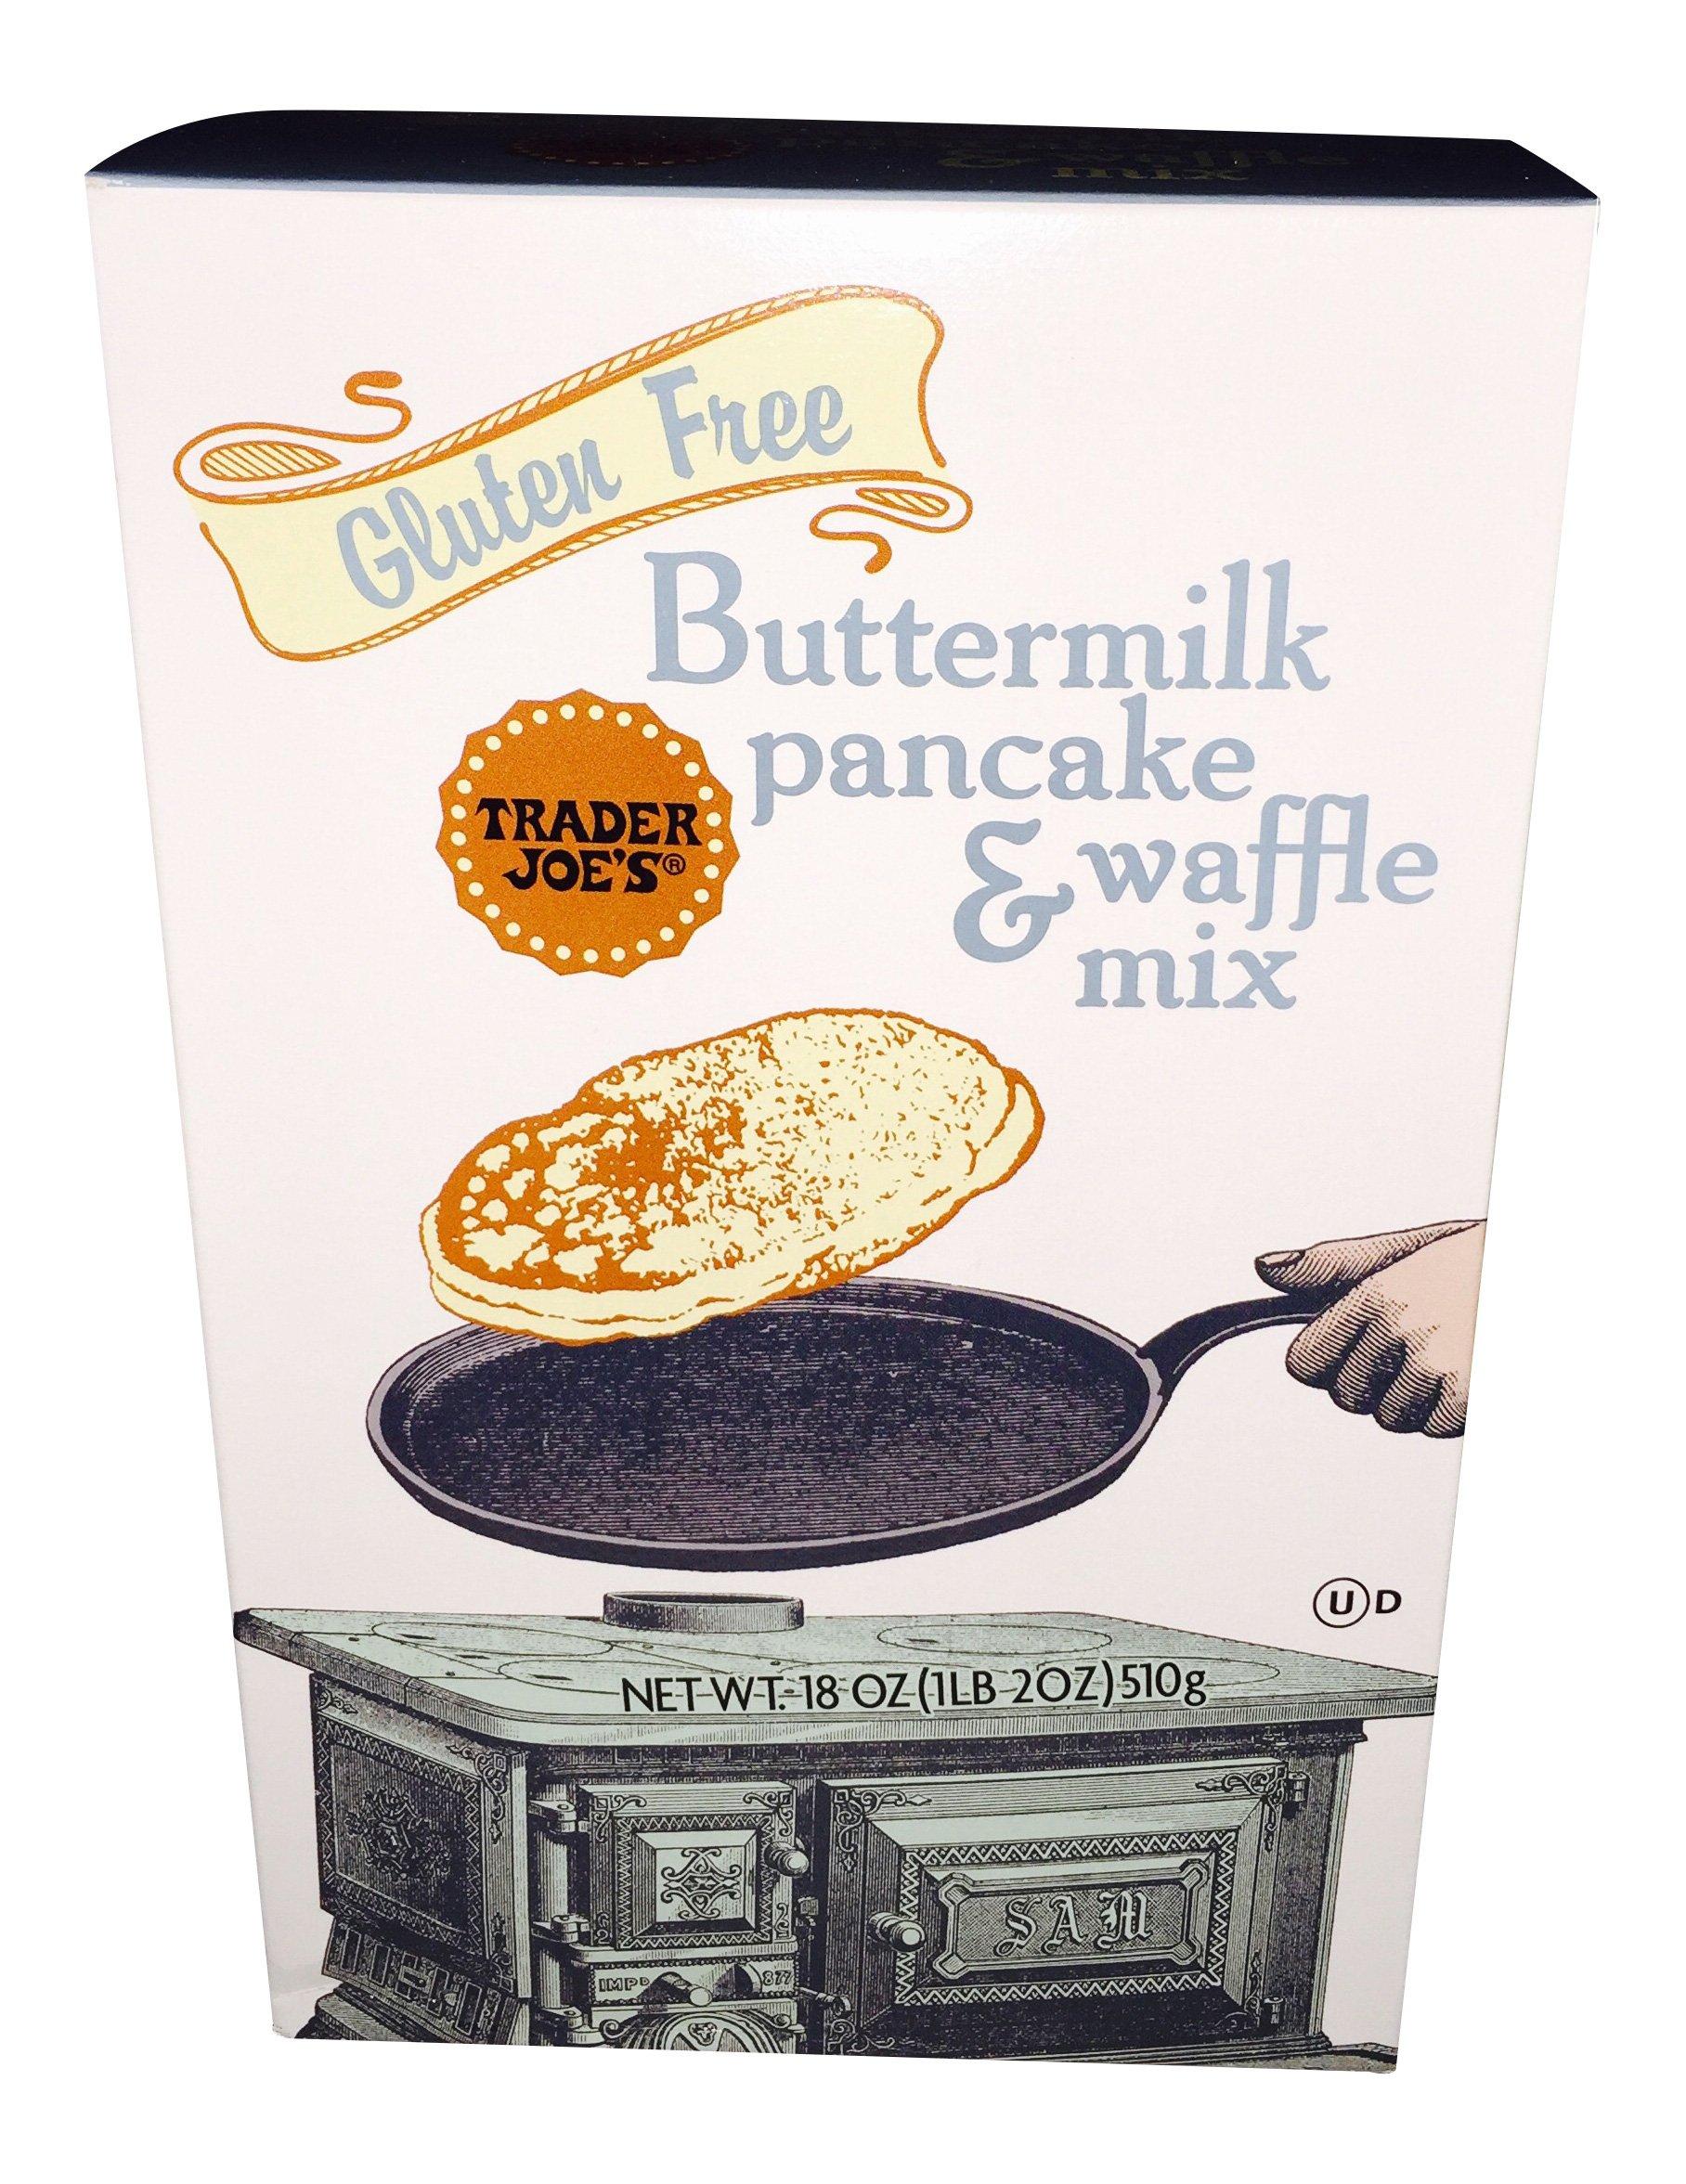 Trader Joe's Gluten Free Buttermilk Pancake & Waffle Mix